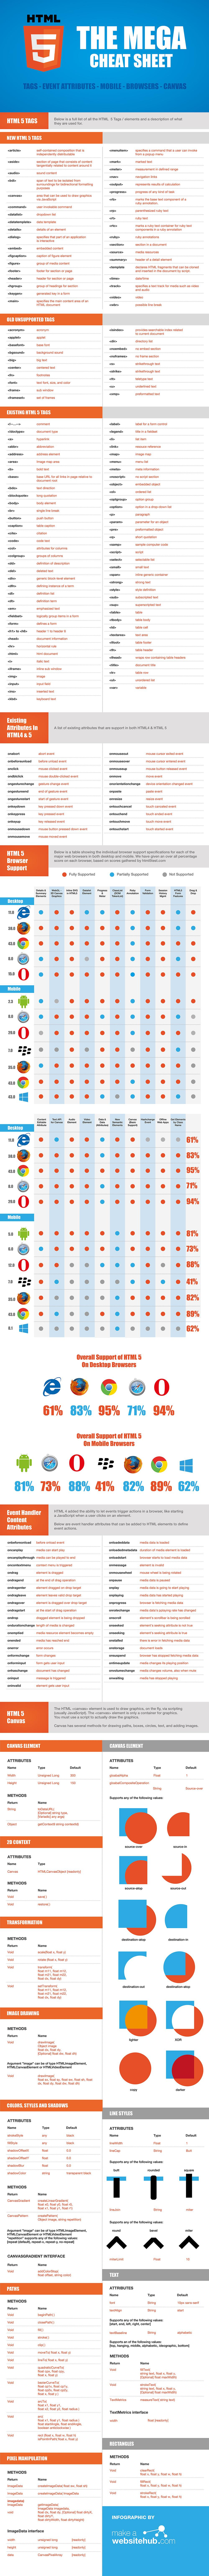 HTML5 Cheat Sheet